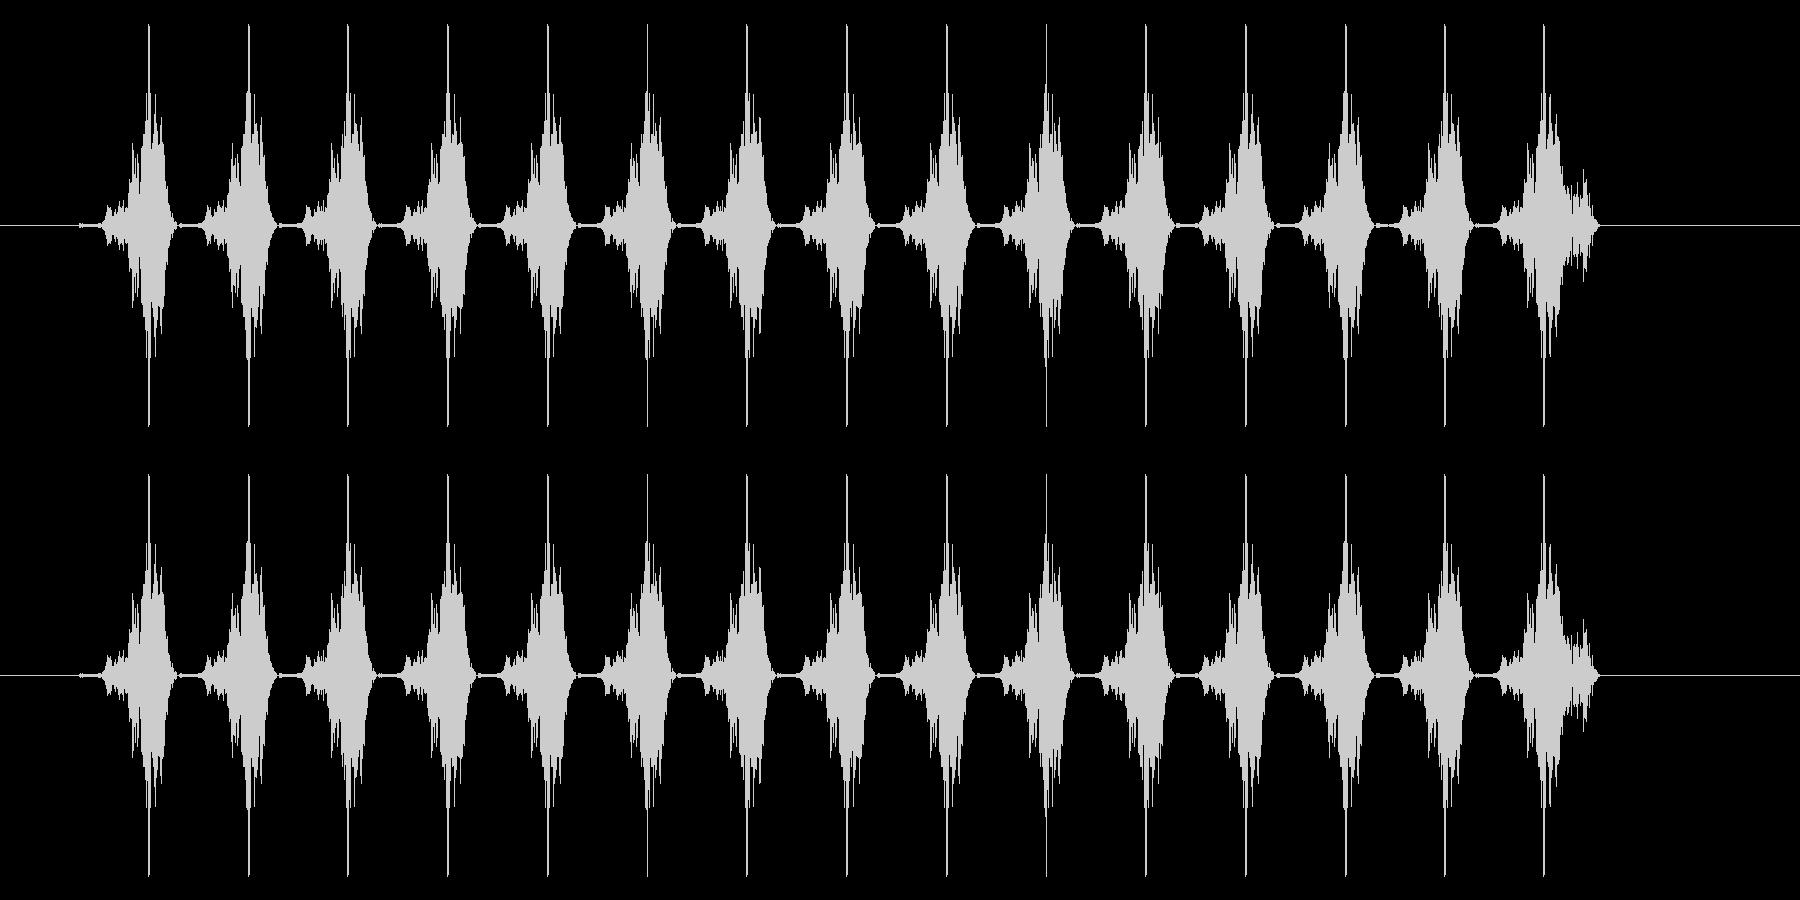 SNES-アクション01-18(メッセーの未再生の波形